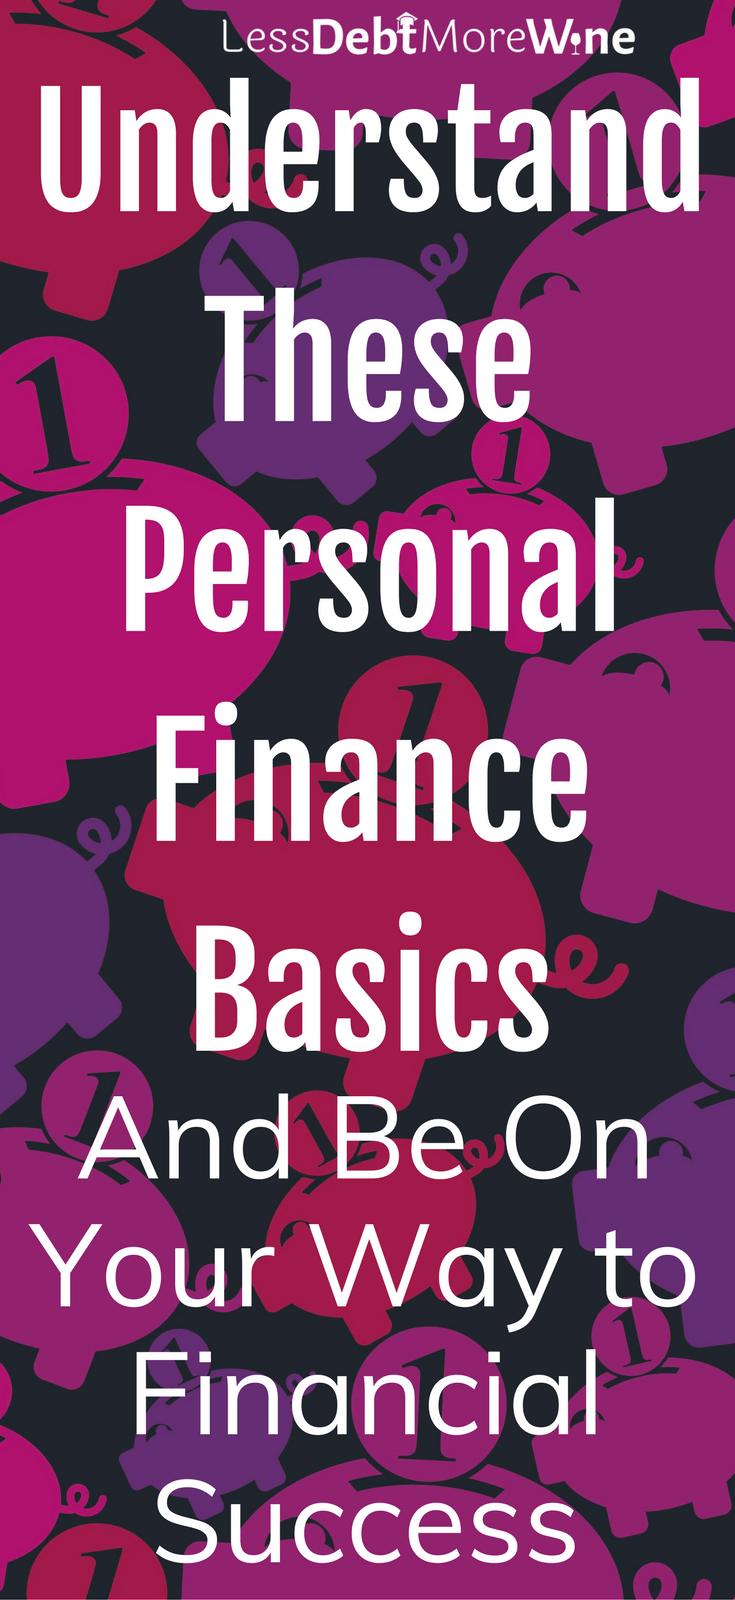 personal finance basics   personal finance tips   money management   money tips   millennial money tips